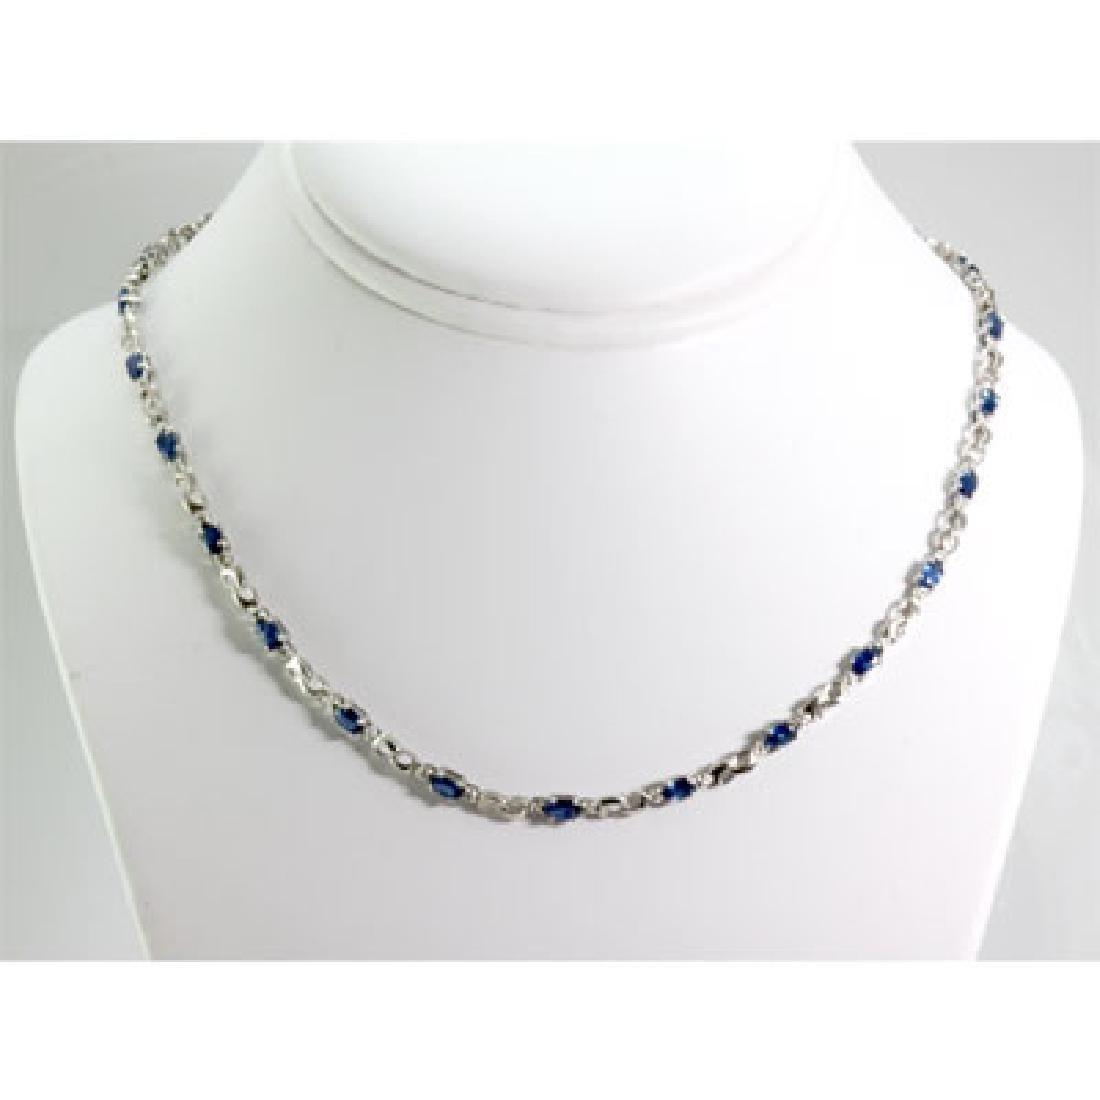 Genuine 4.62 ctw Tanzanite Diamond Necklace10k W/Y Gold